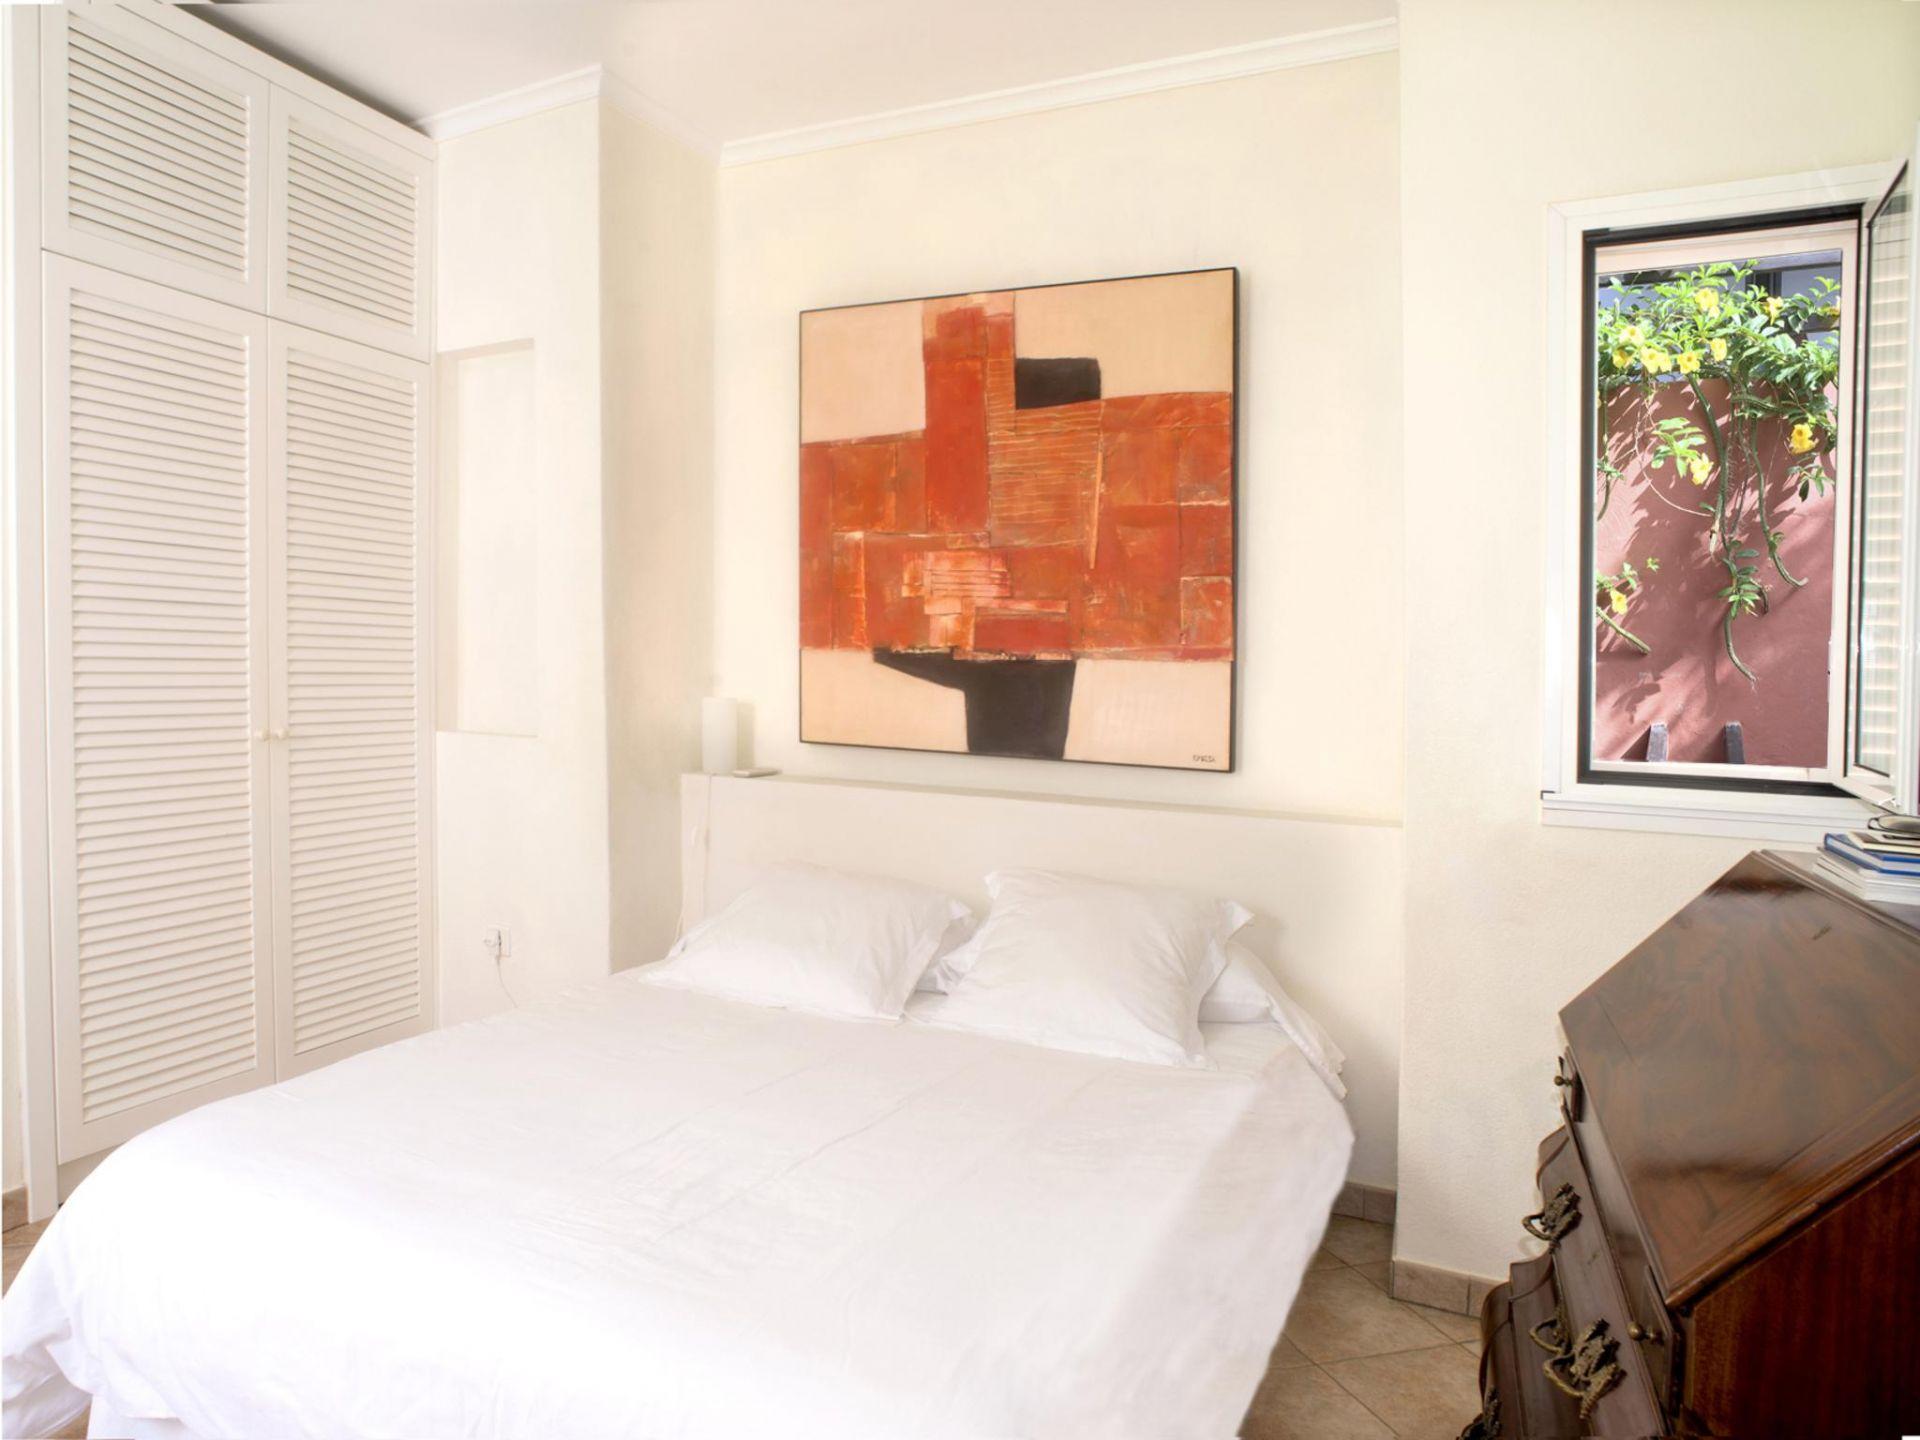 Holiday apartment Villa San Agustin 10 - Holiday Rental (854295), Maspalomas, Gran Canaria, Canary Islands, Spain, picture 18